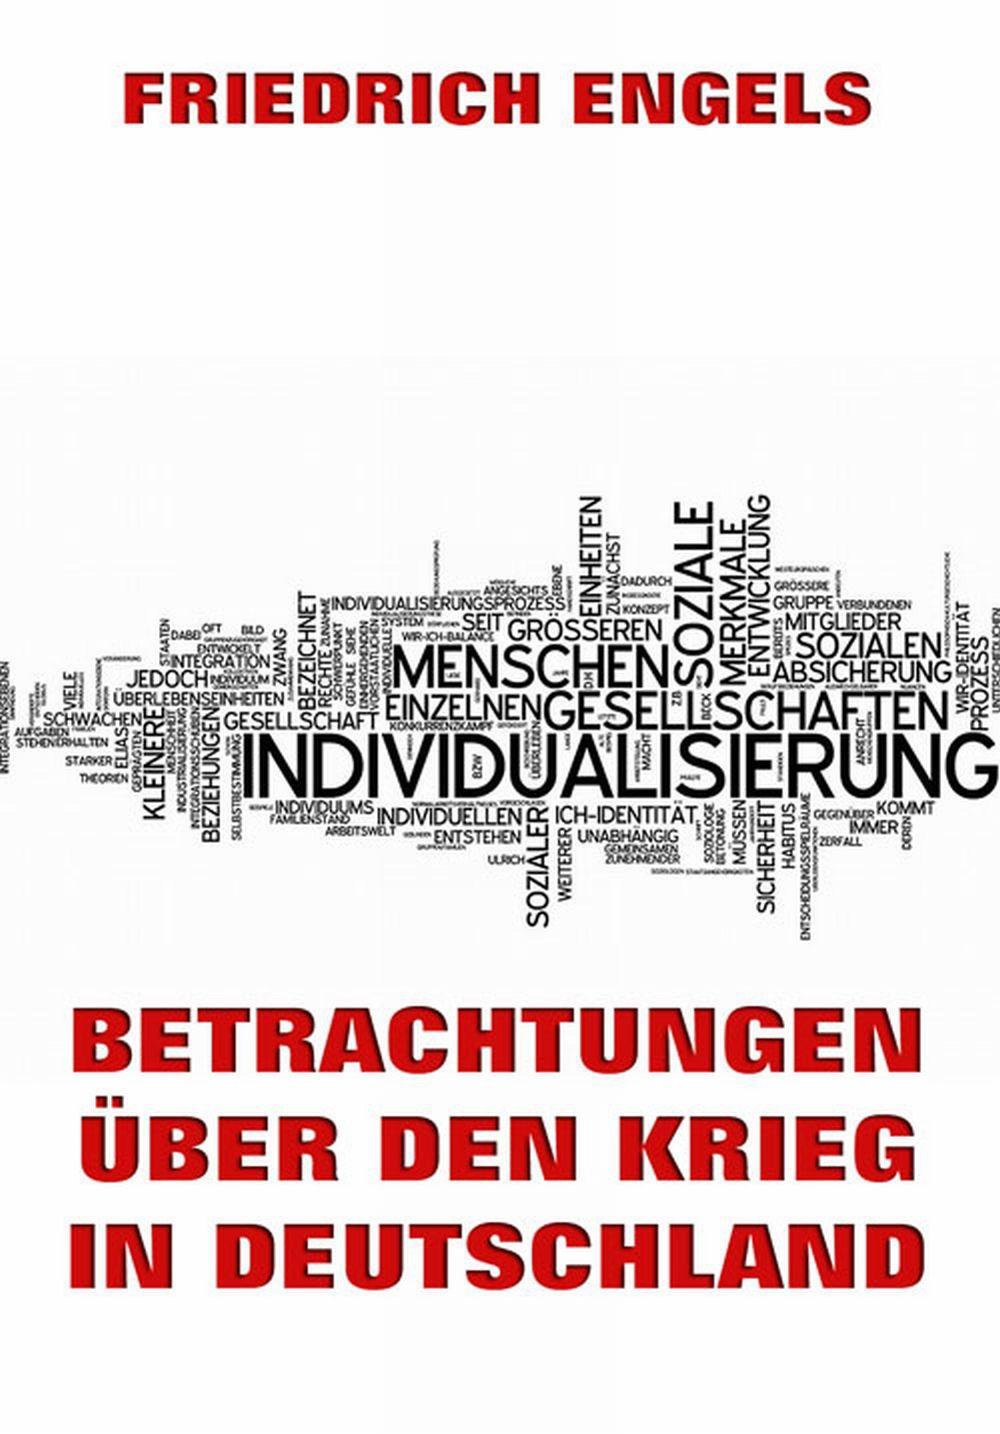 Friedrich Engels Betrachtungen über den Krieg in Deutschland jack wolfskin джемпер флисовый женский jack wolfskin high cloud размер 44